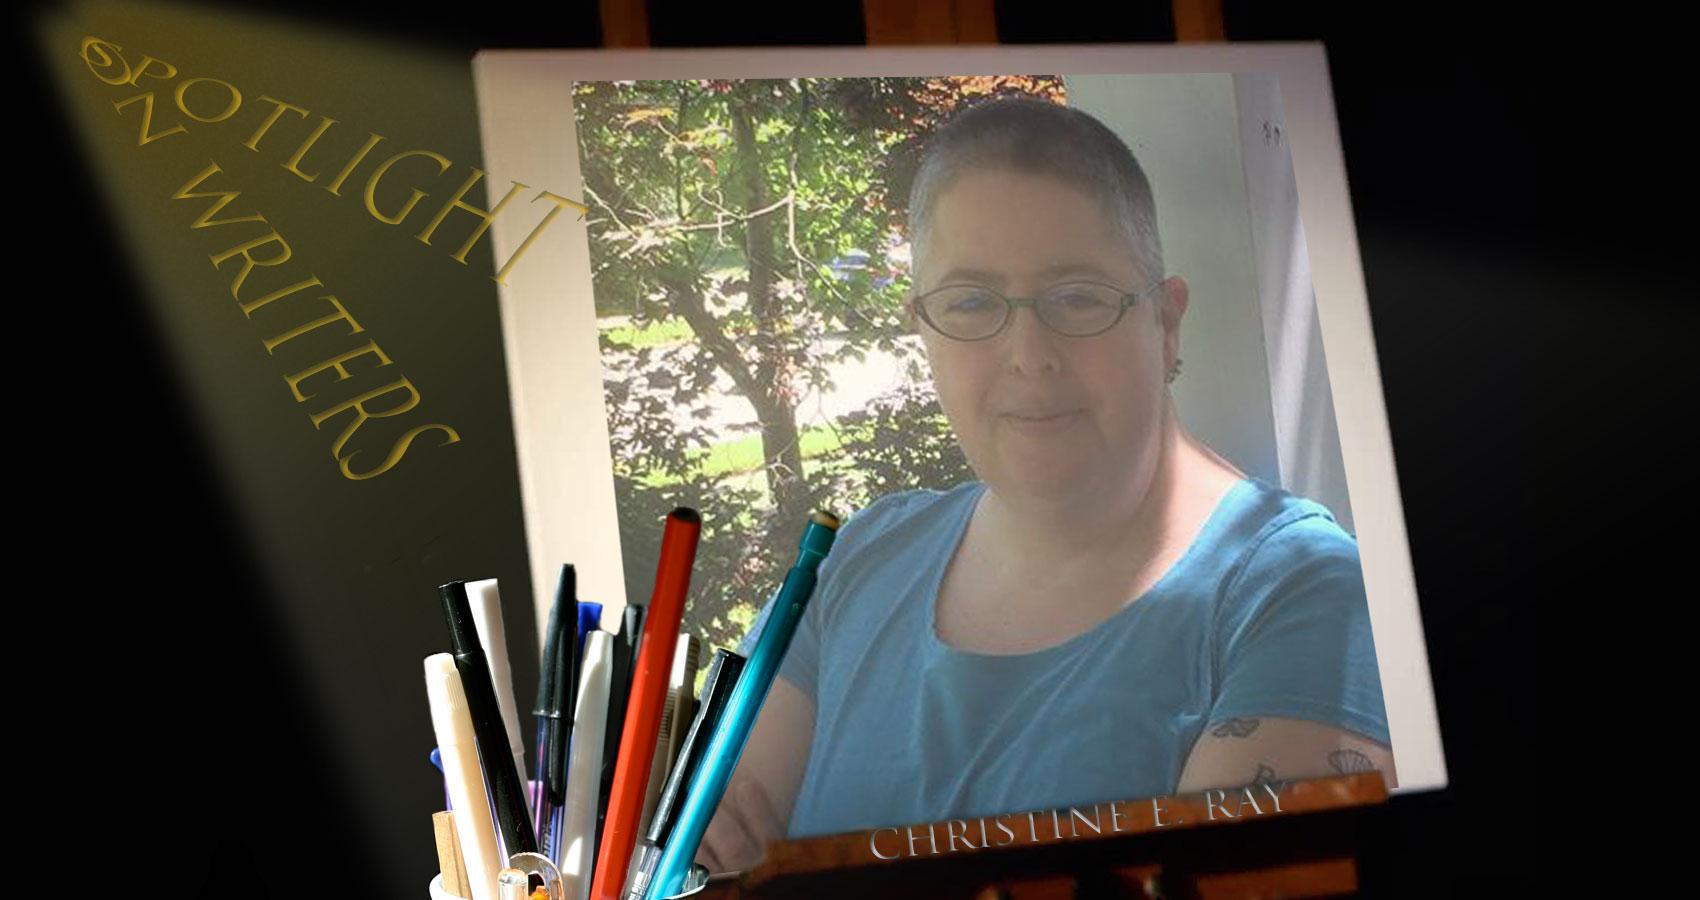 Spotlight On Writers - Christine E. Ray at Spillwords.com